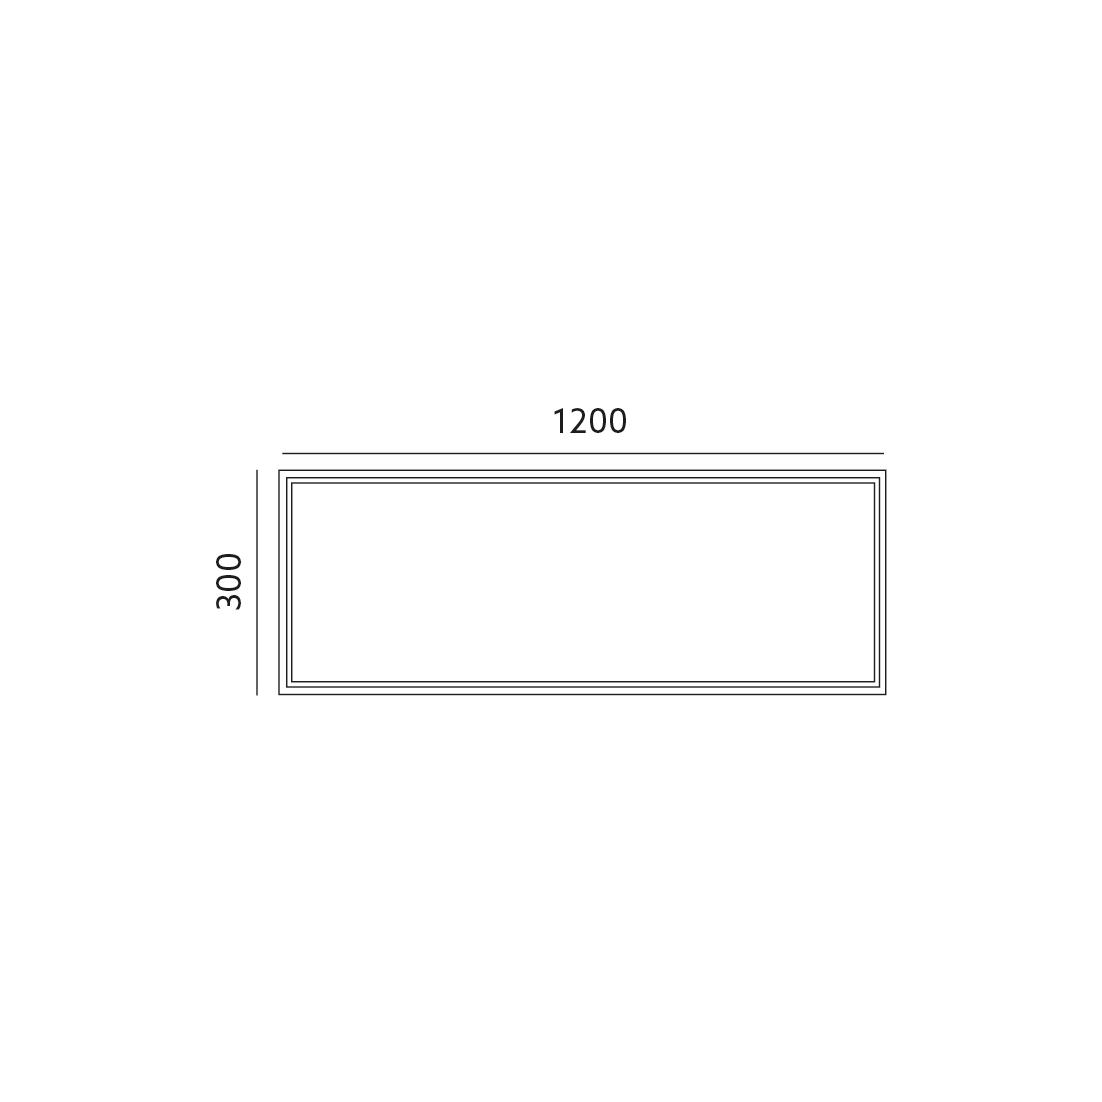 RAMKA NT DO PANELU LED 30X120 KLIK - KFNORK30120